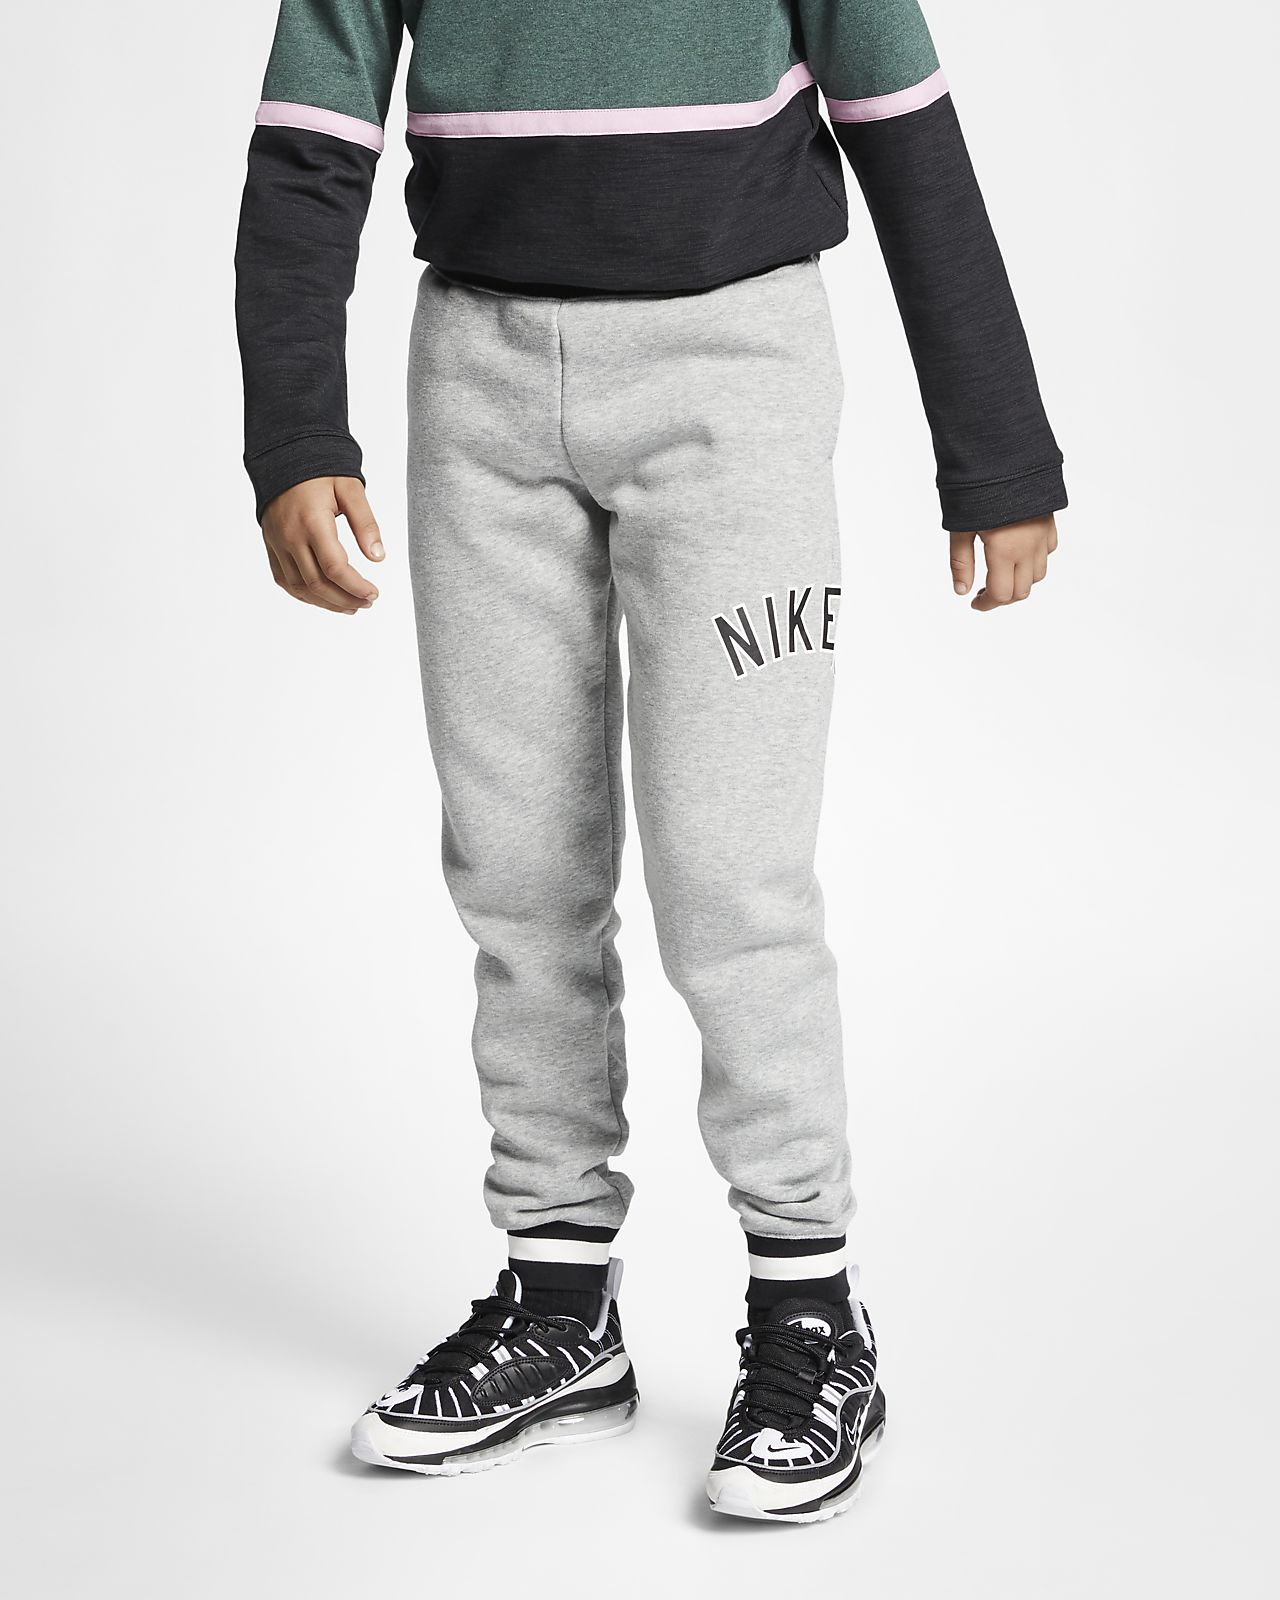 Nike Air Pantalons - Nen/a